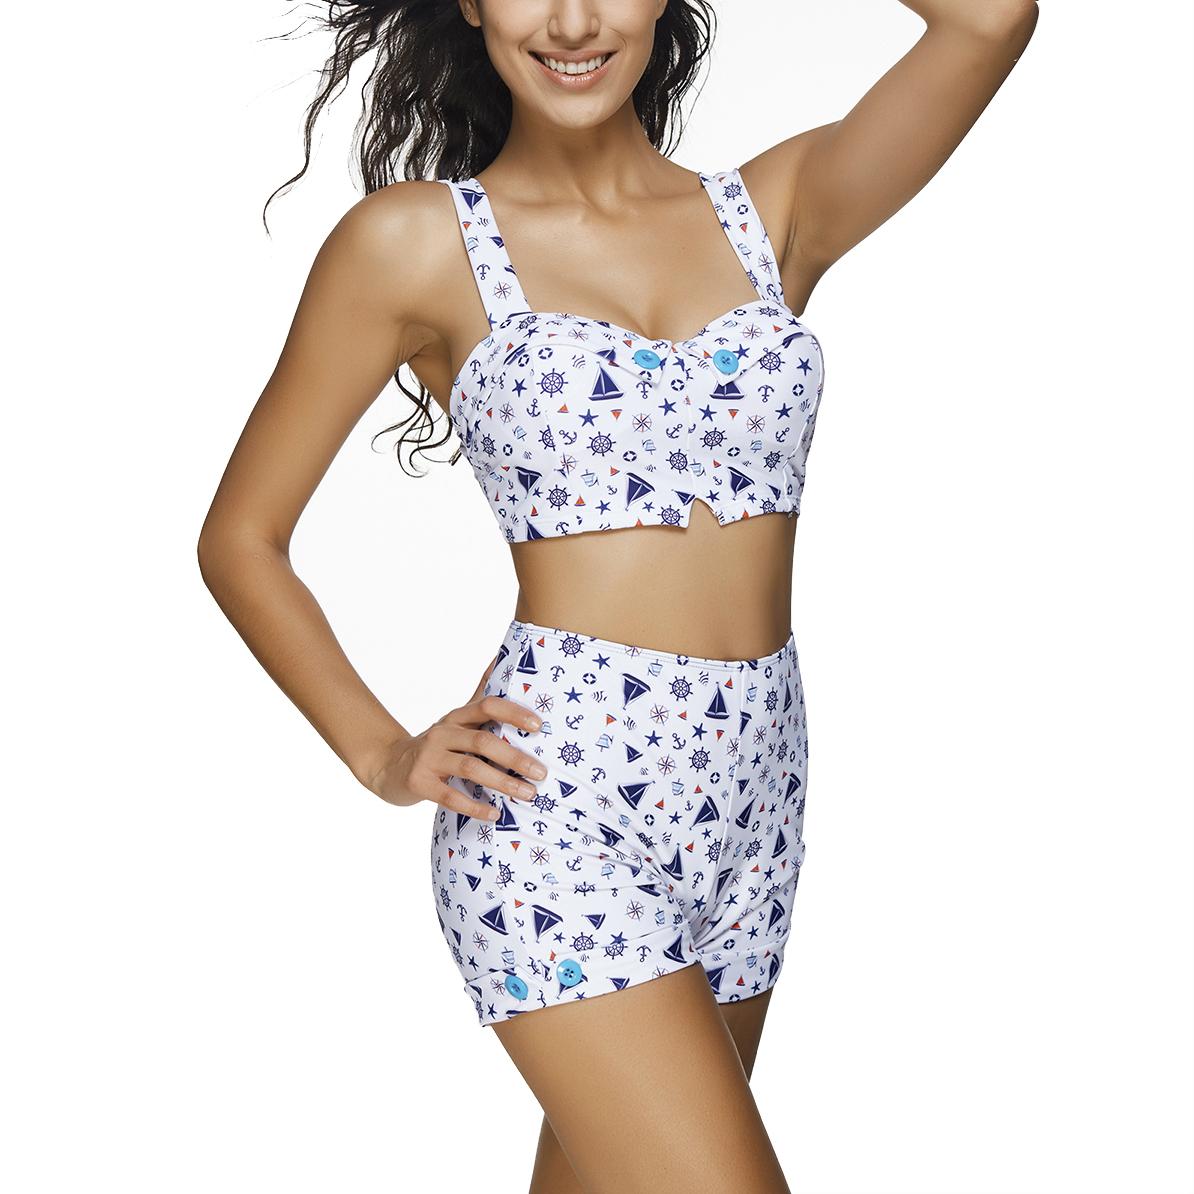 Women's Padded Push Up High Waist Two Pieces Bikini Set